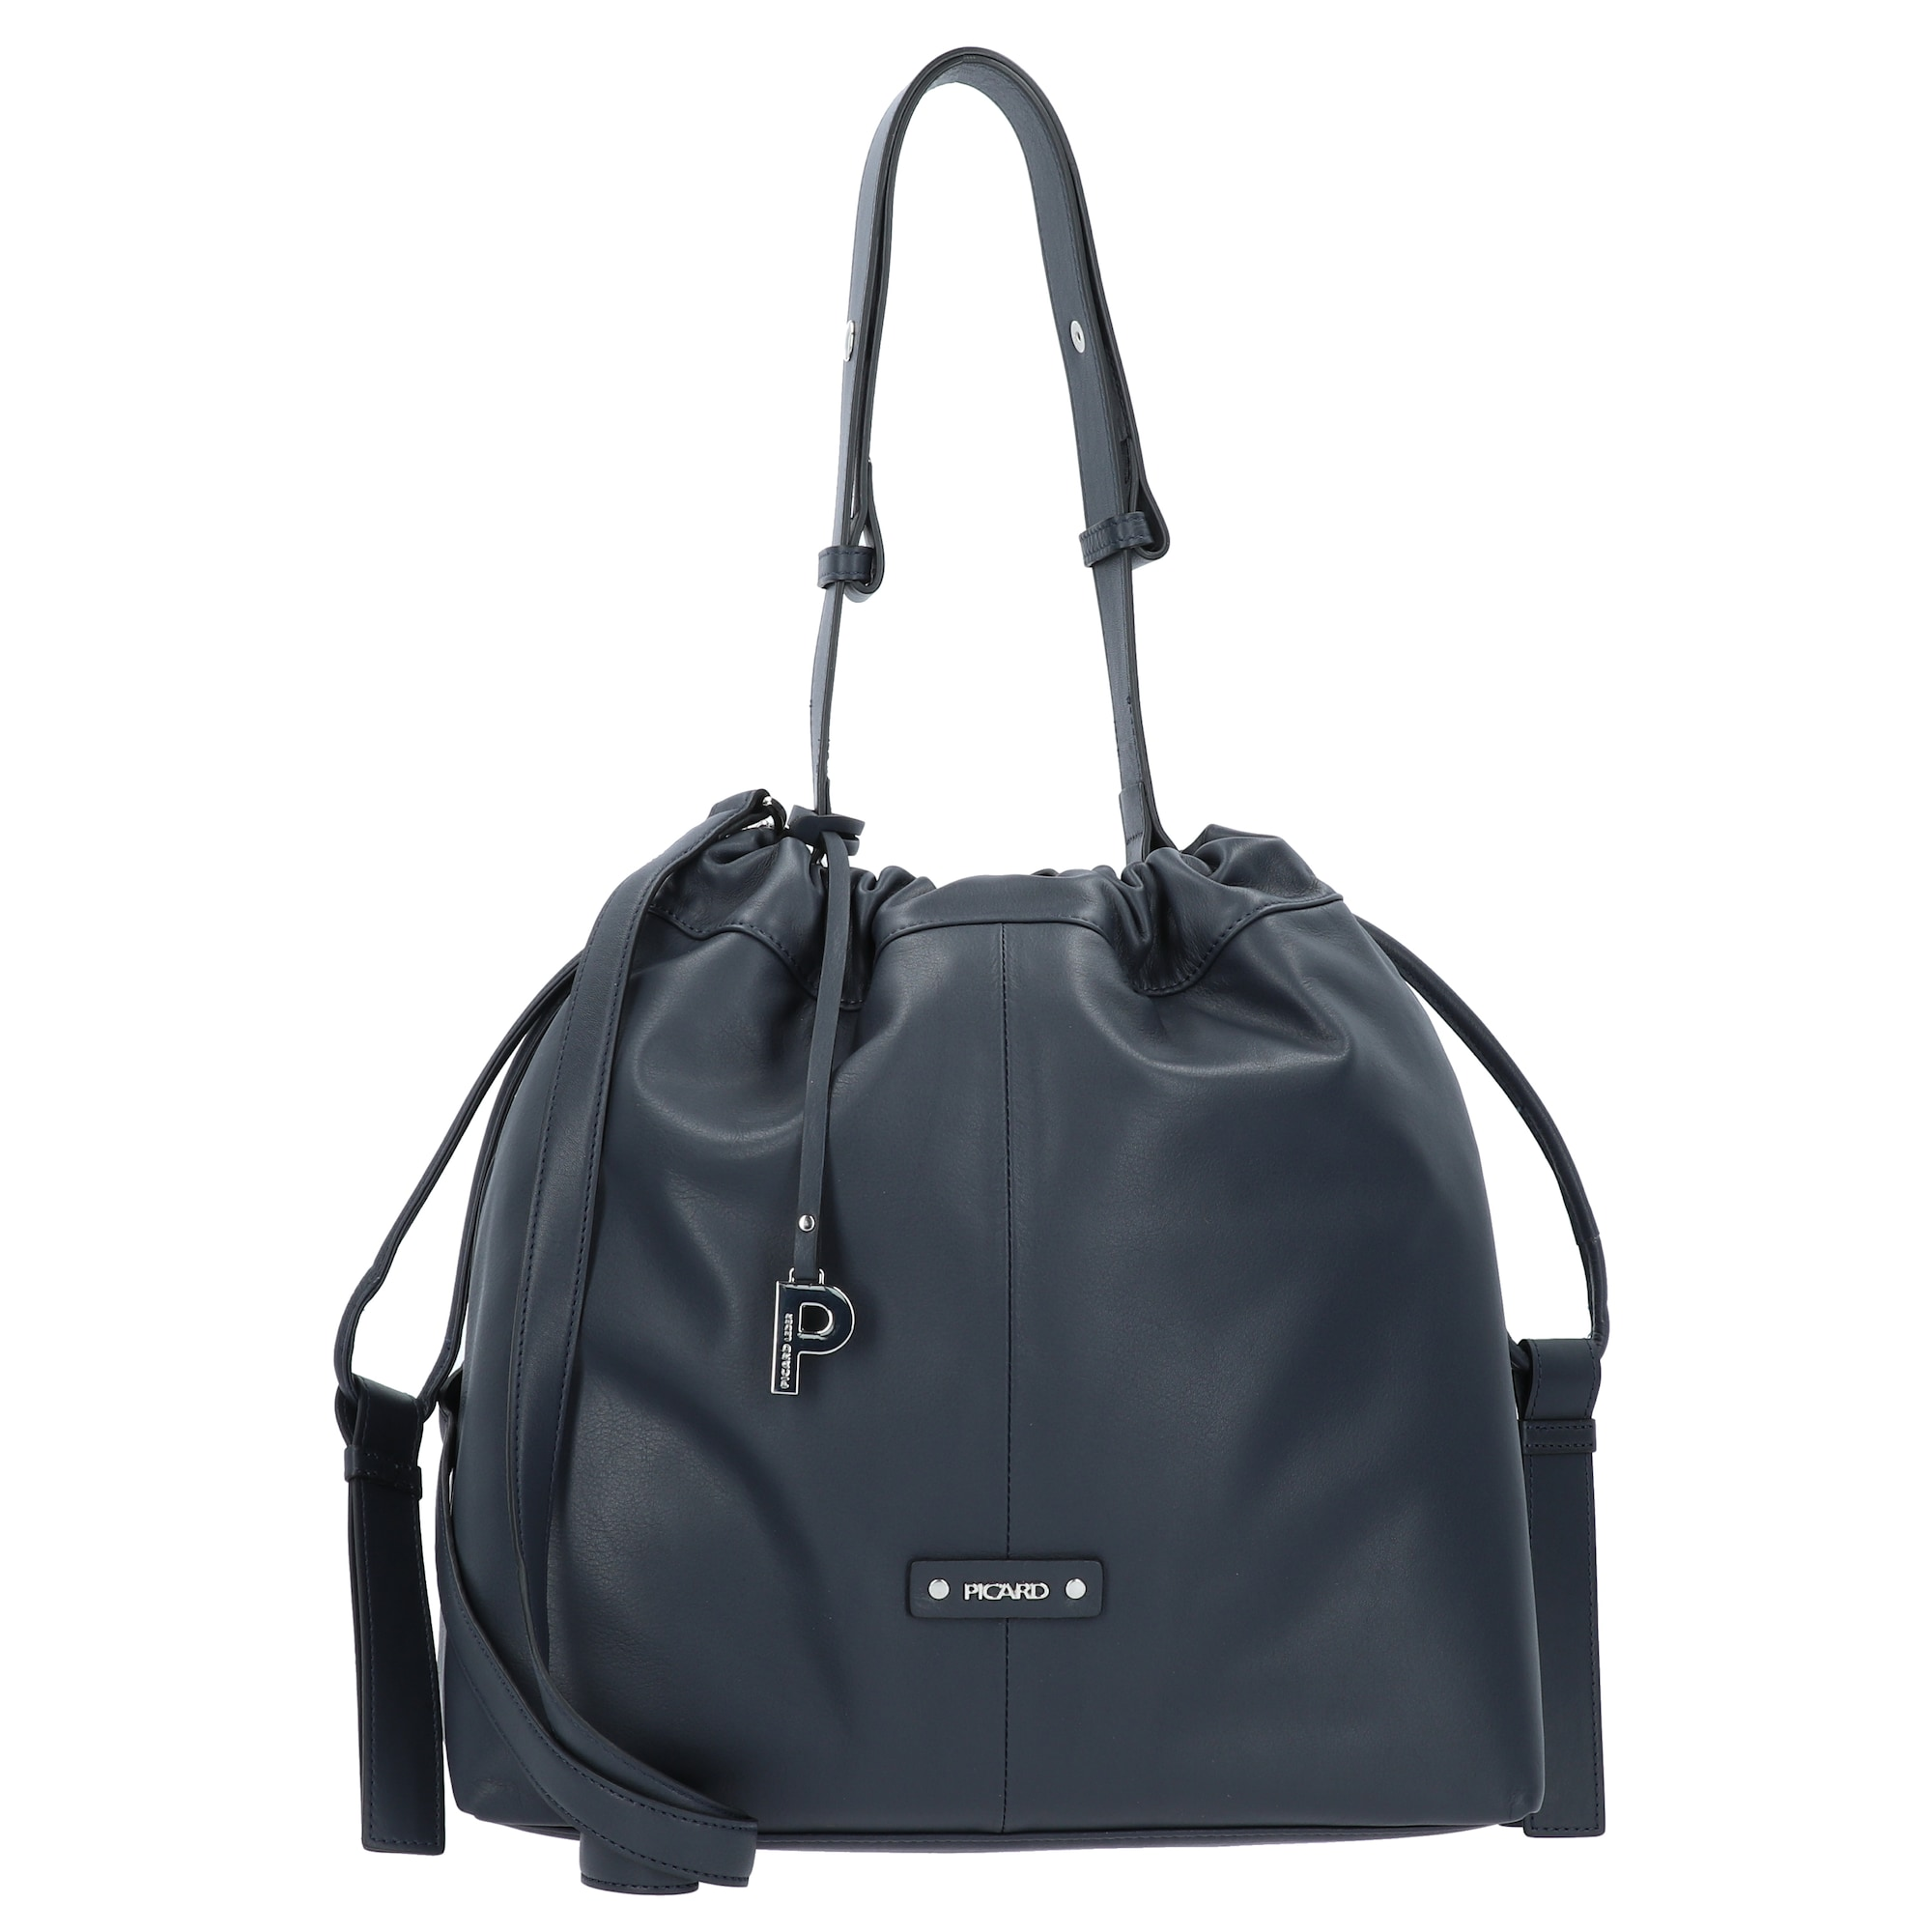 Beuteltasche | Taschen > Handtaschen > Beuteltaschen | Picard